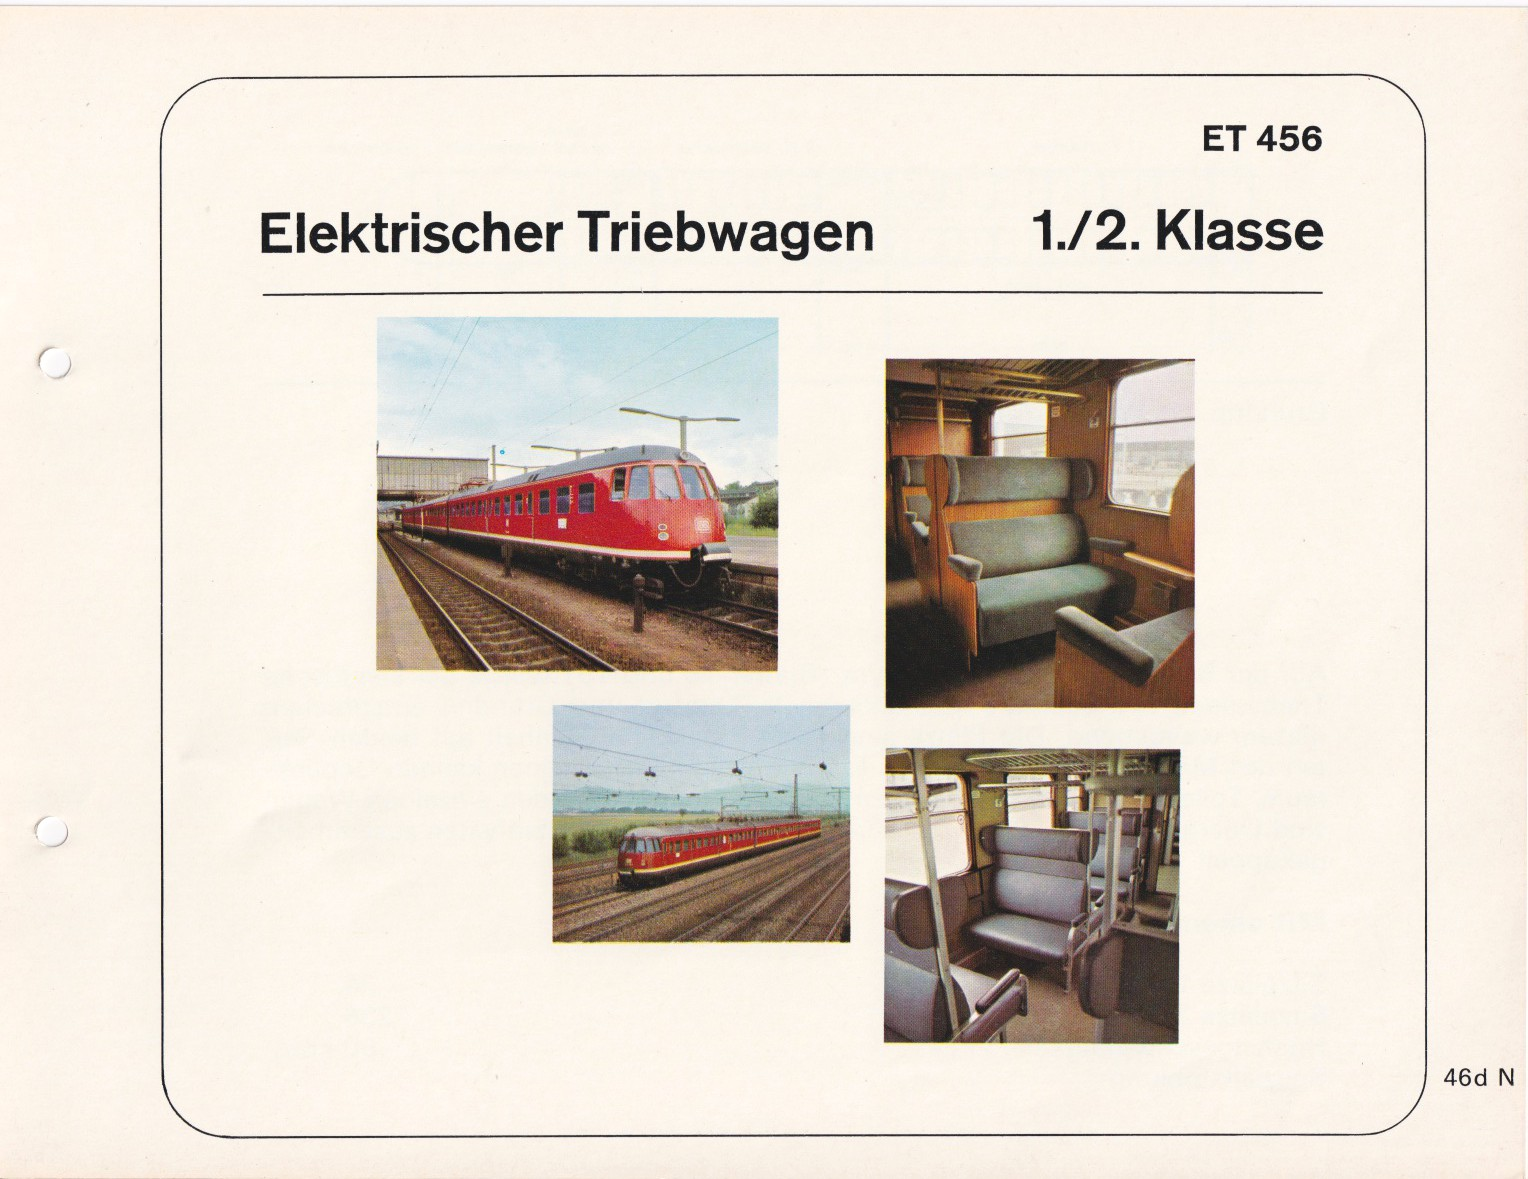 https://www.nullclub.de/hifo/Fahrzeuglexikon/Wagen46i.jpg